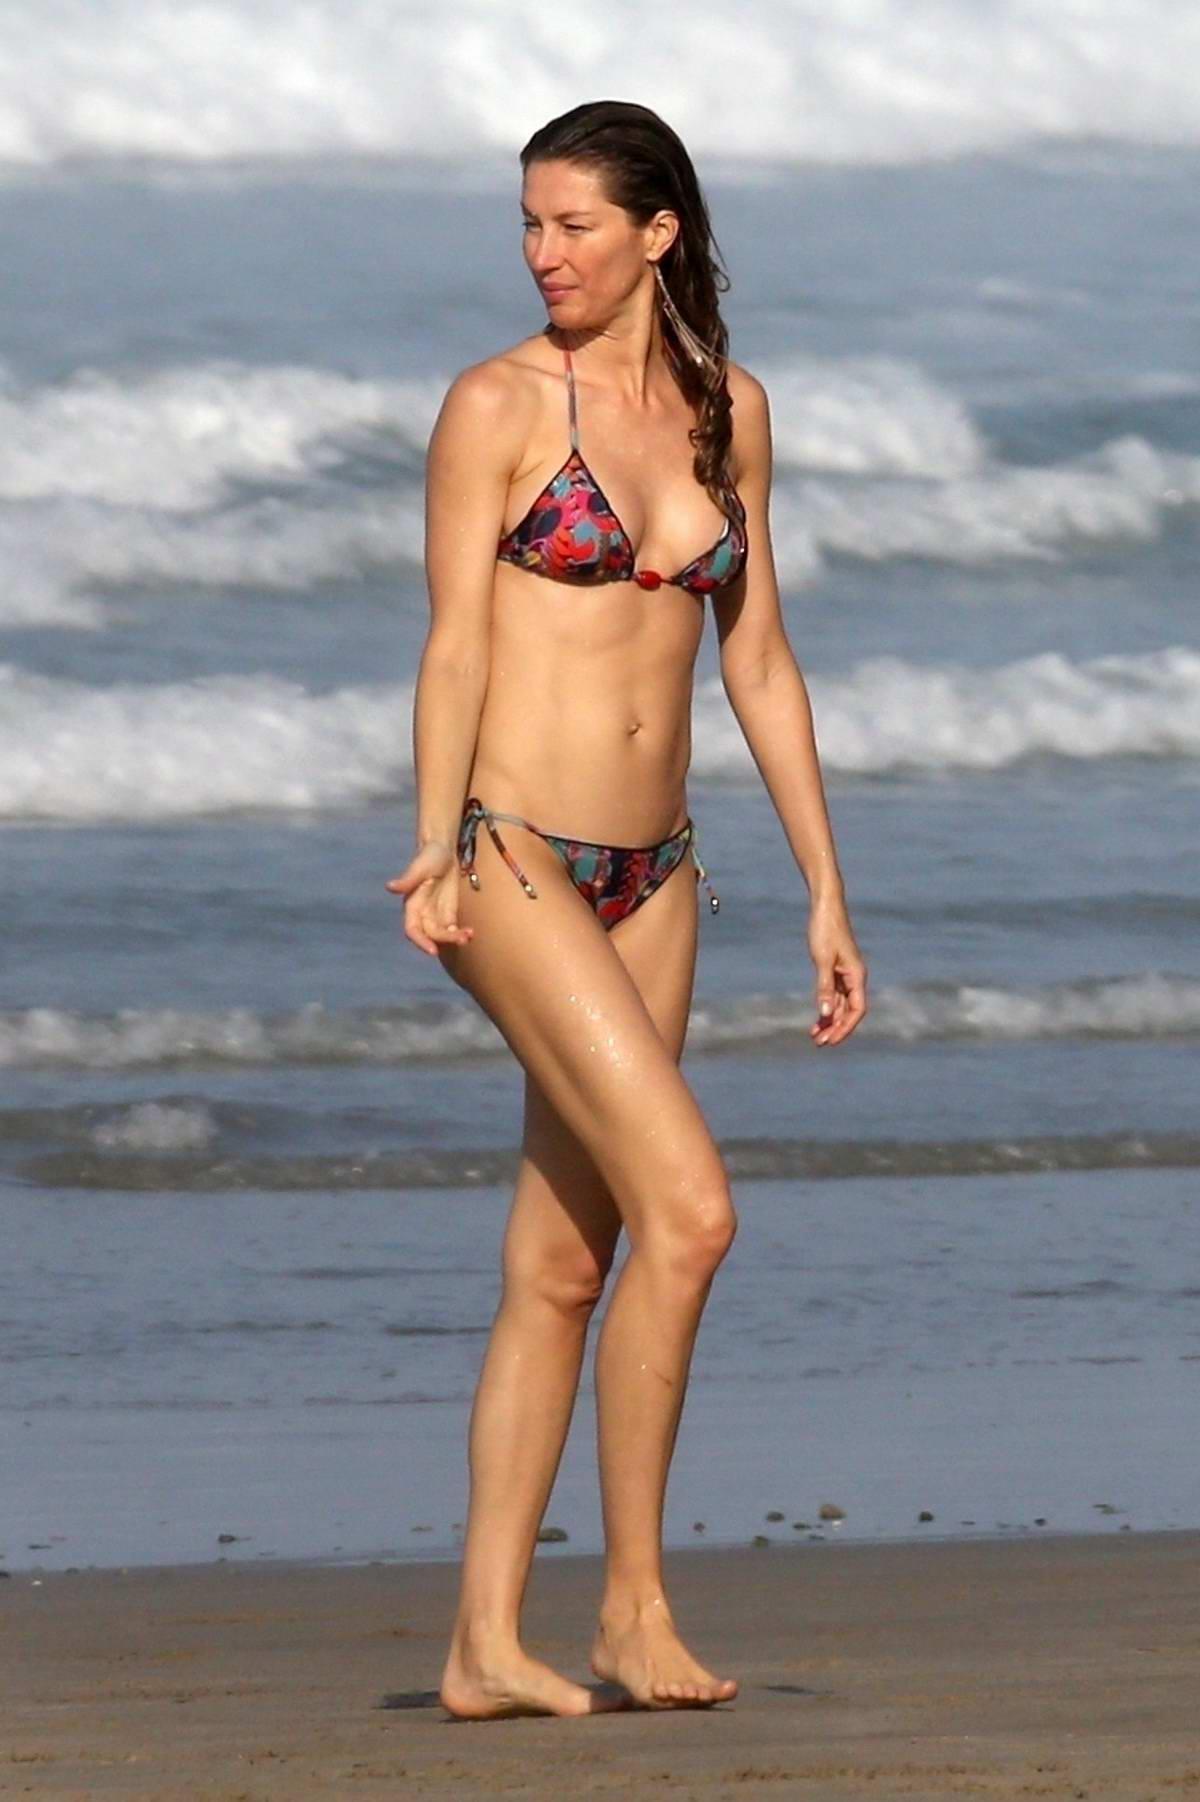 a238c245e14df Gisele Bundchen wears a colorful bikini while she and Tom Brady celebrates  Valentine s Day on the beach in Costa Rica